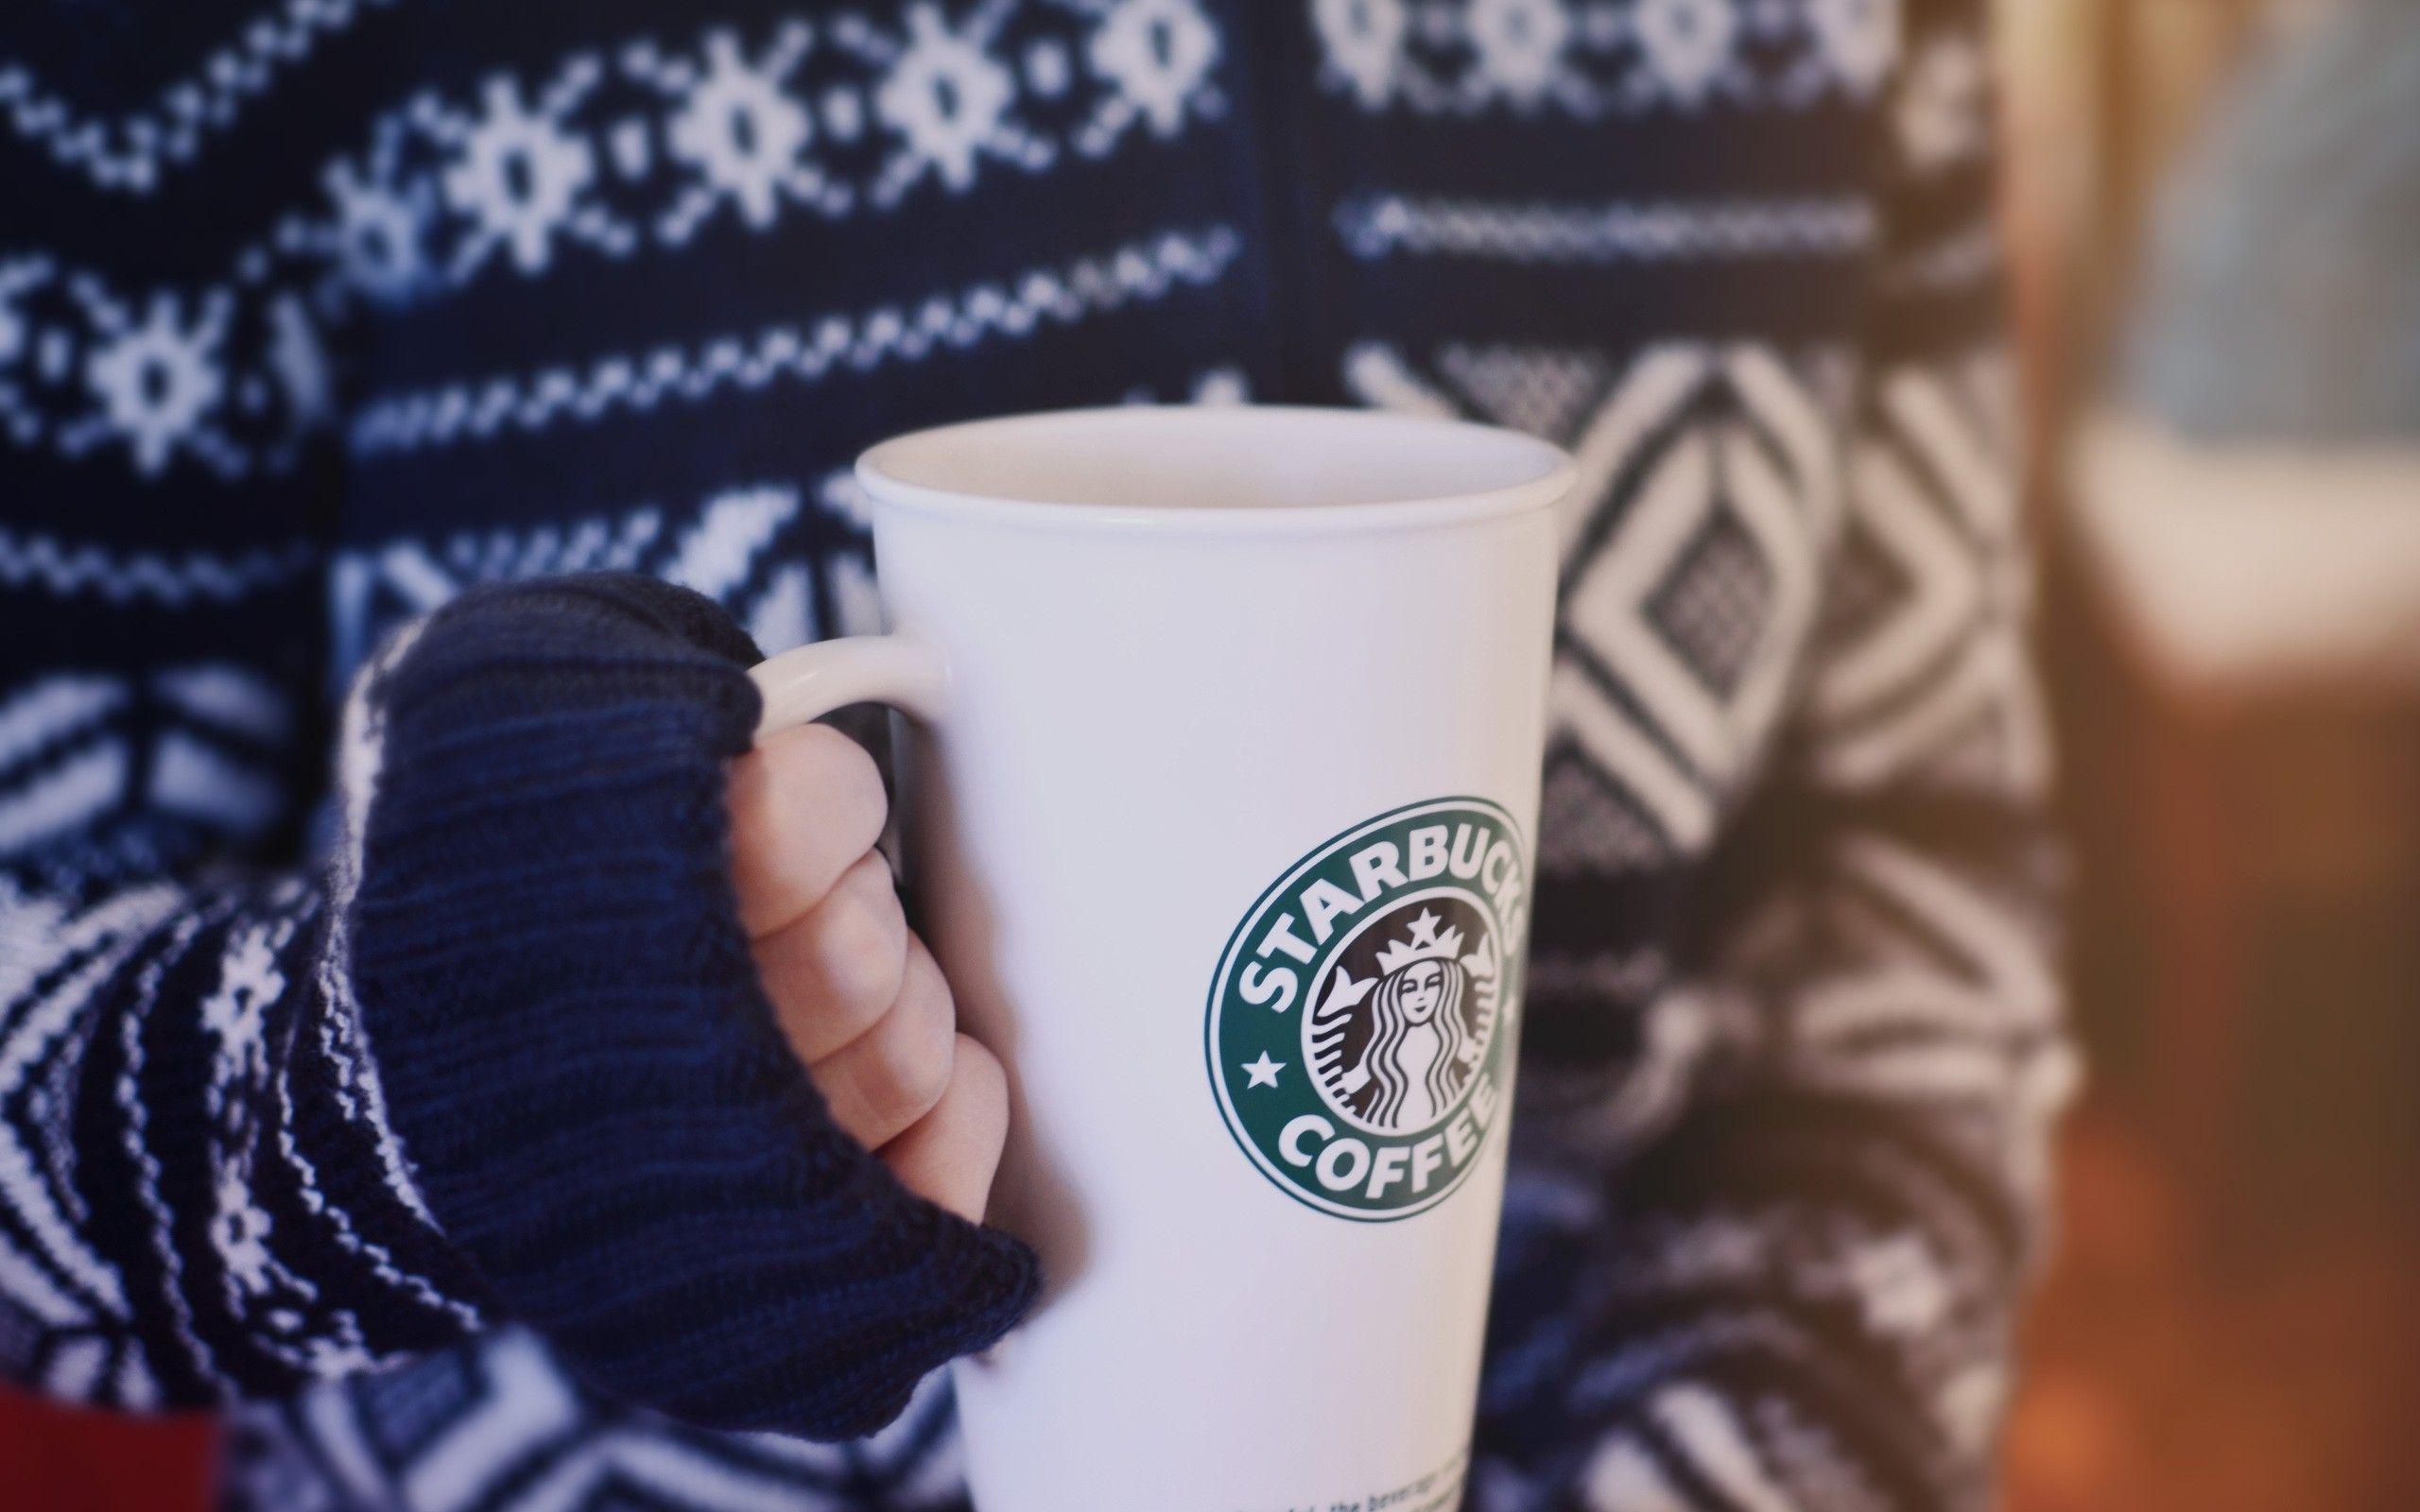 Desktop Wallpaper Hd Starbucks Coffee Kanye West Spongebob Youtube ...